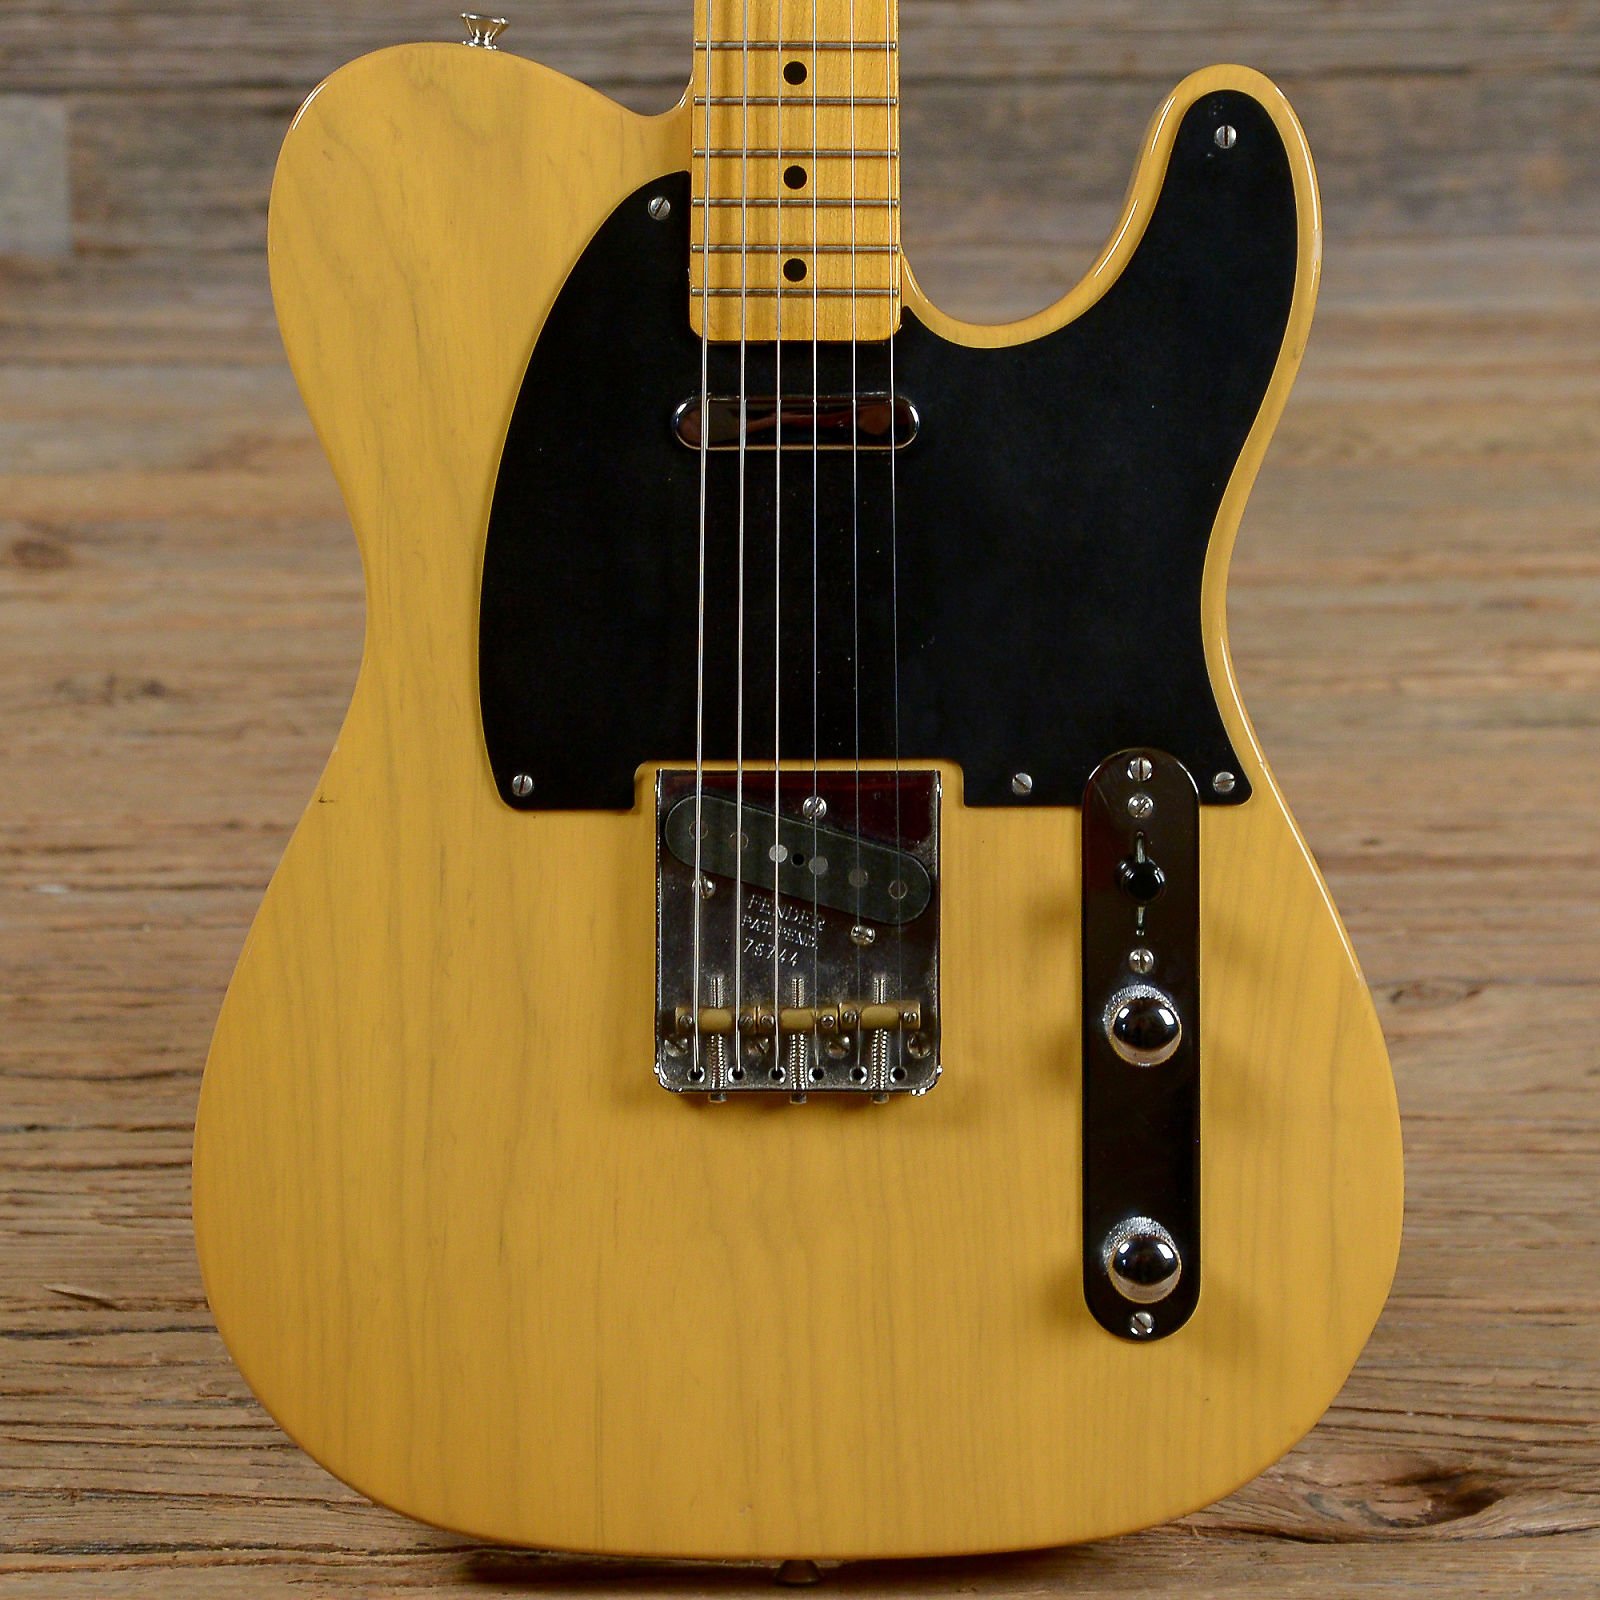 Fender American Vintage 52 Telecaster Butterscotch